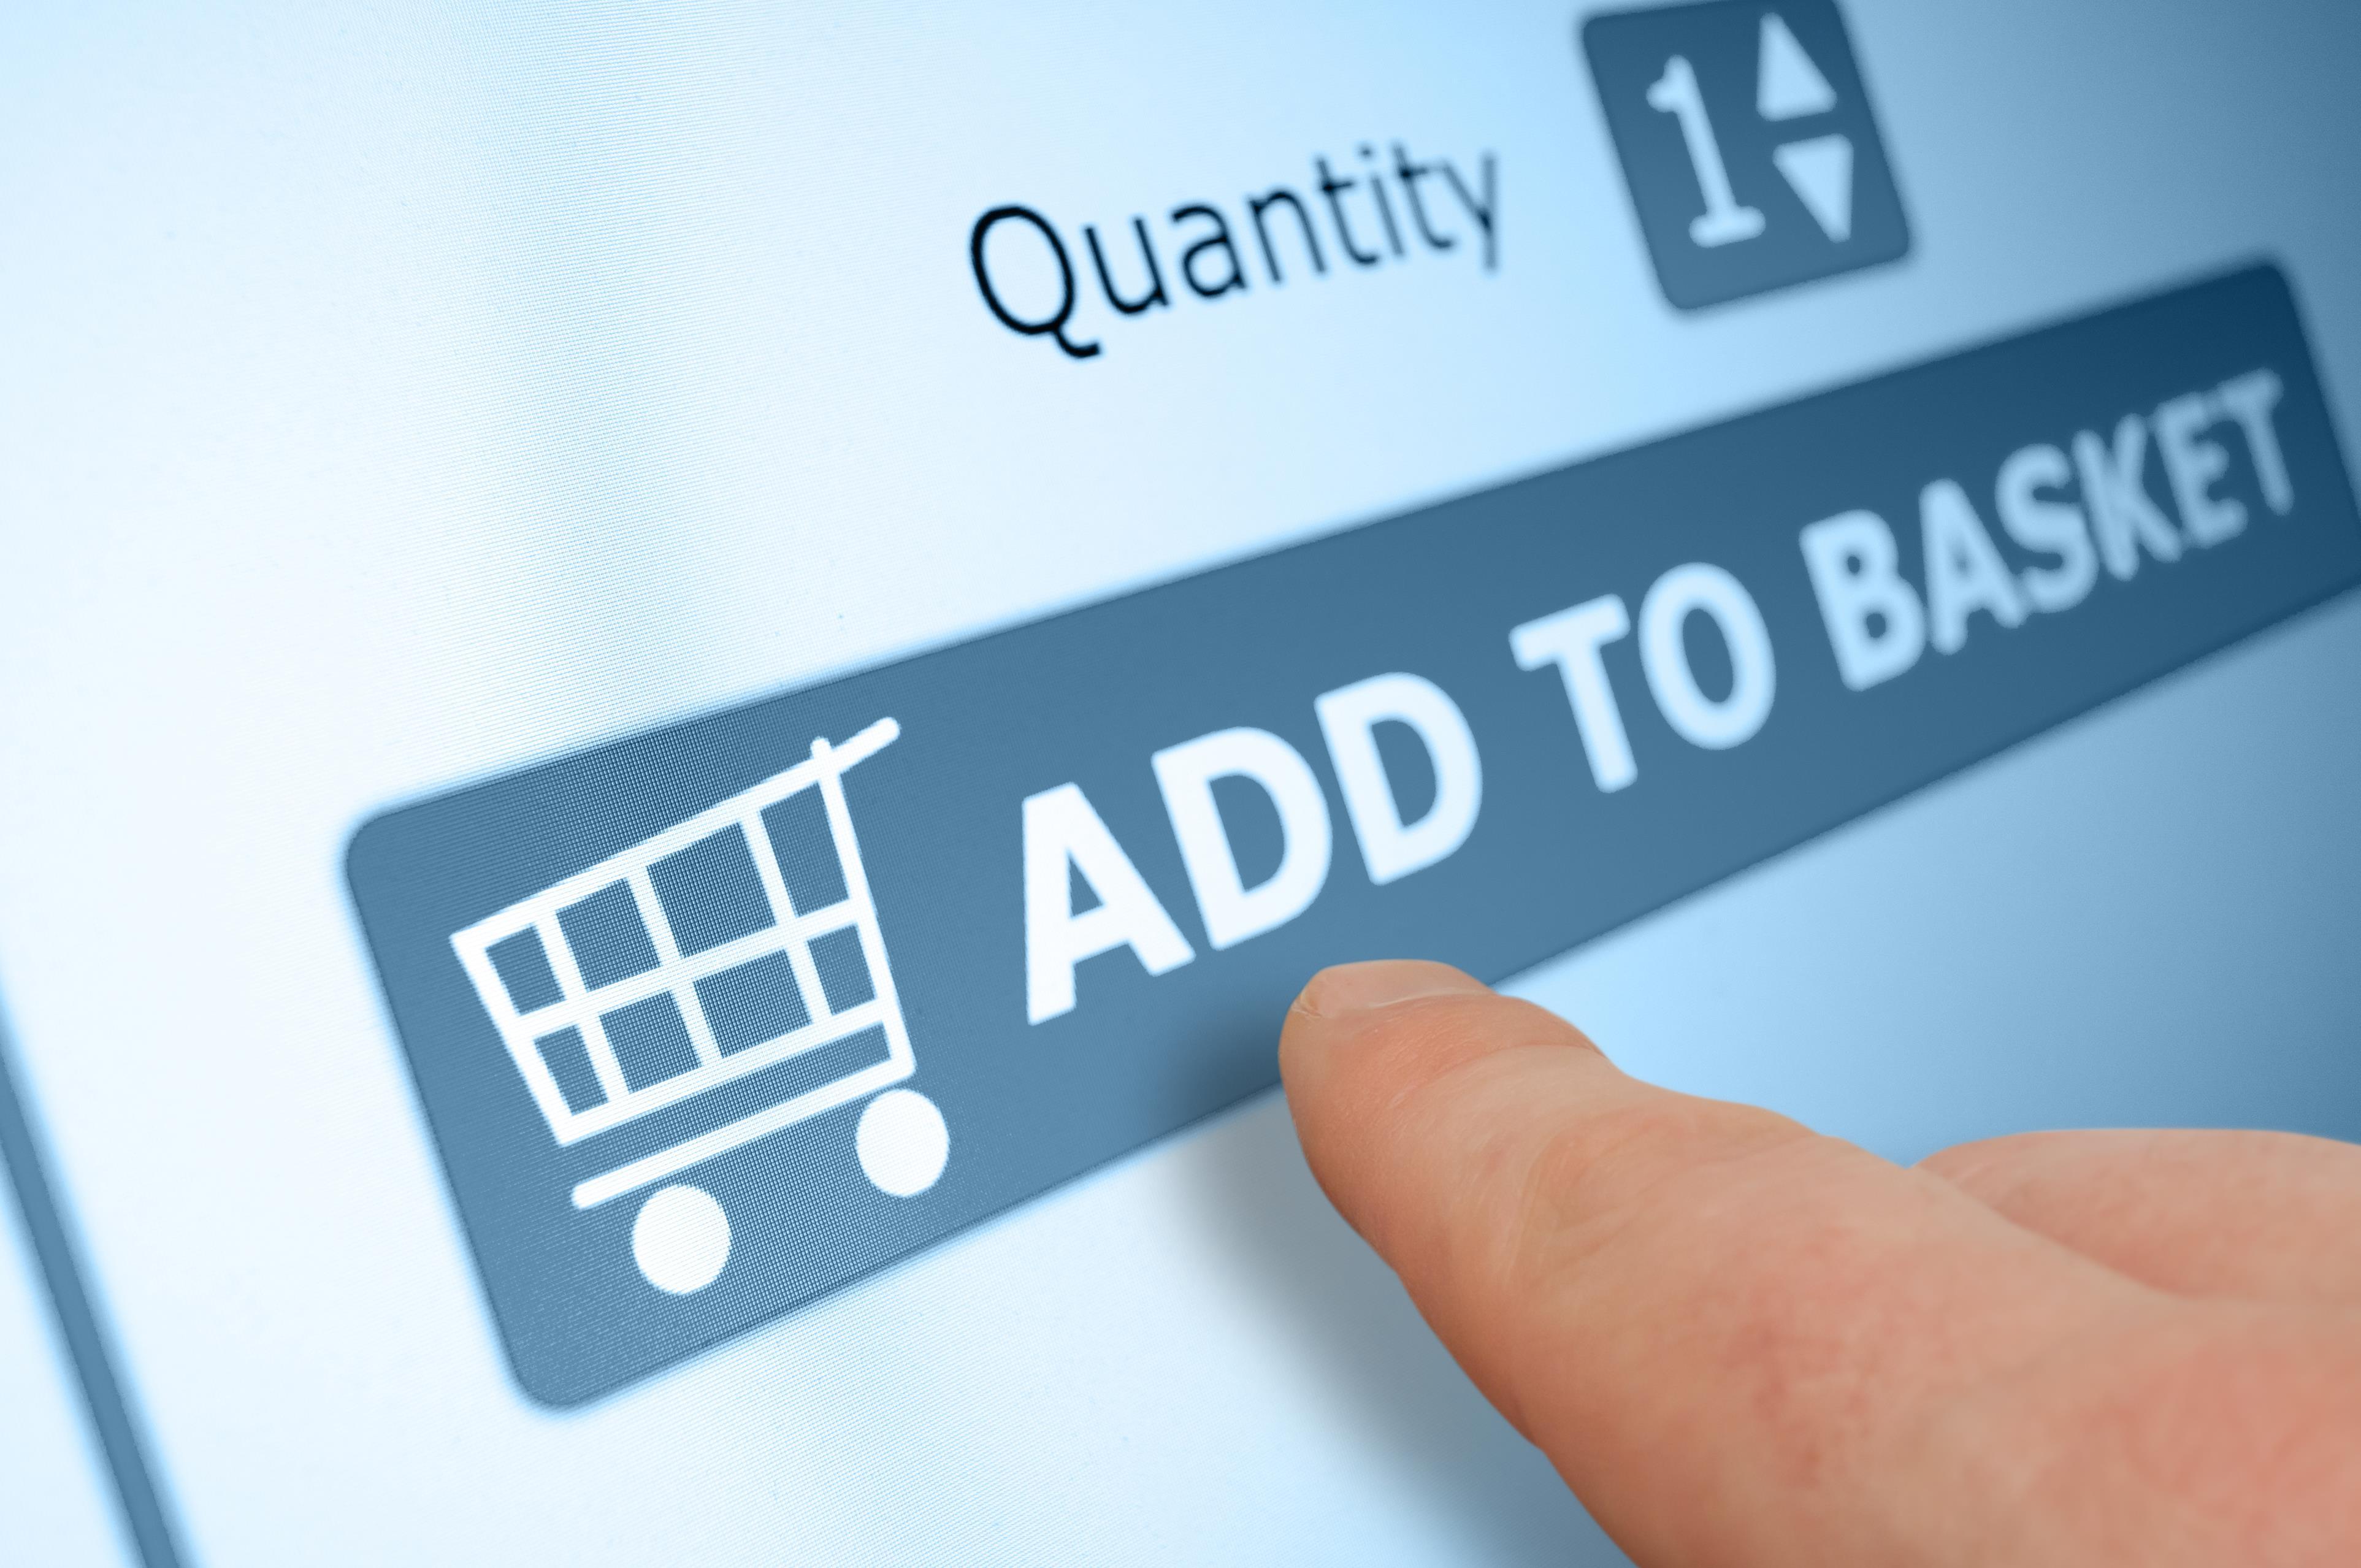 Online shop ()